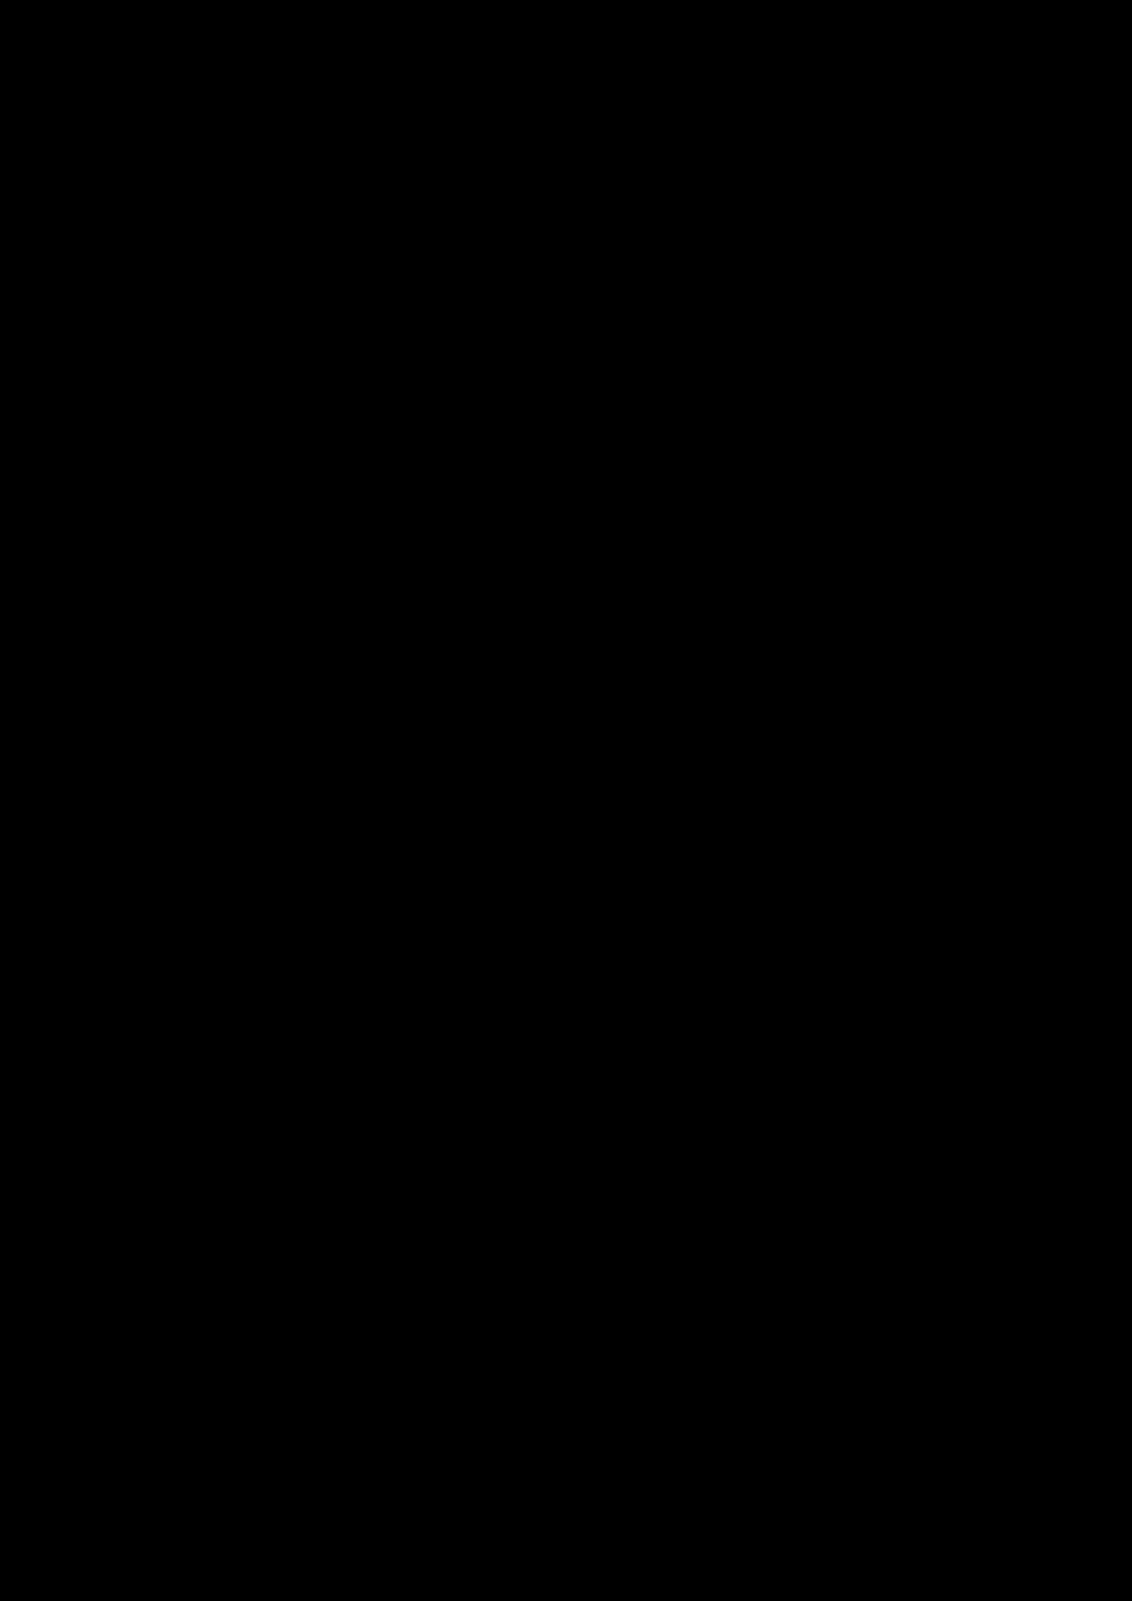 Ot Bolshogo Uma slide, Image 17